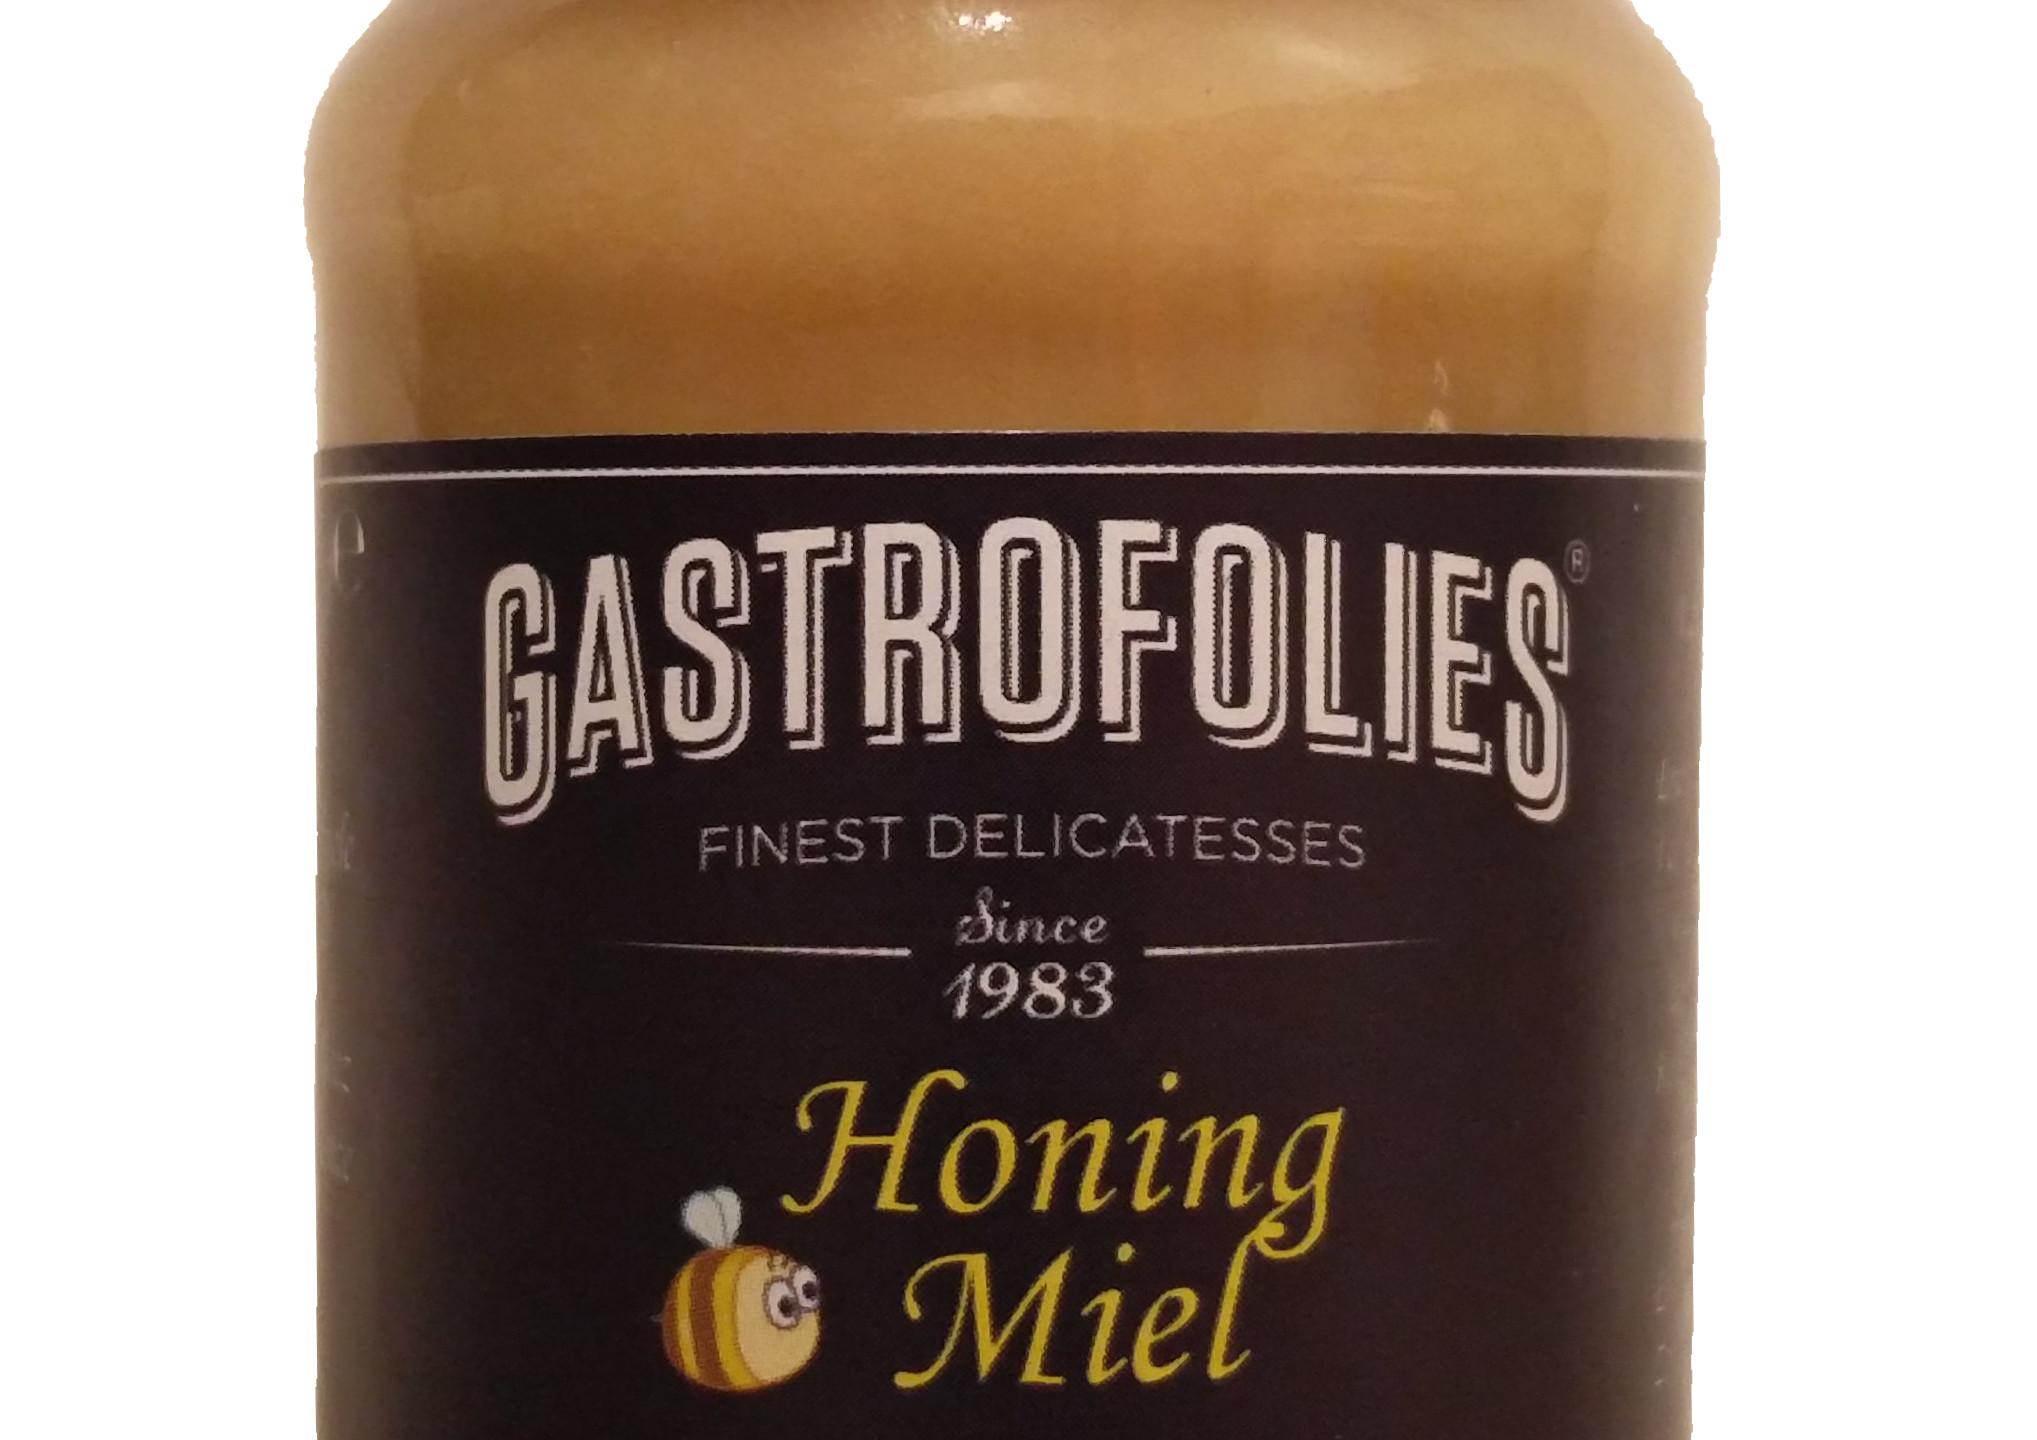 Honing Gastrofolies